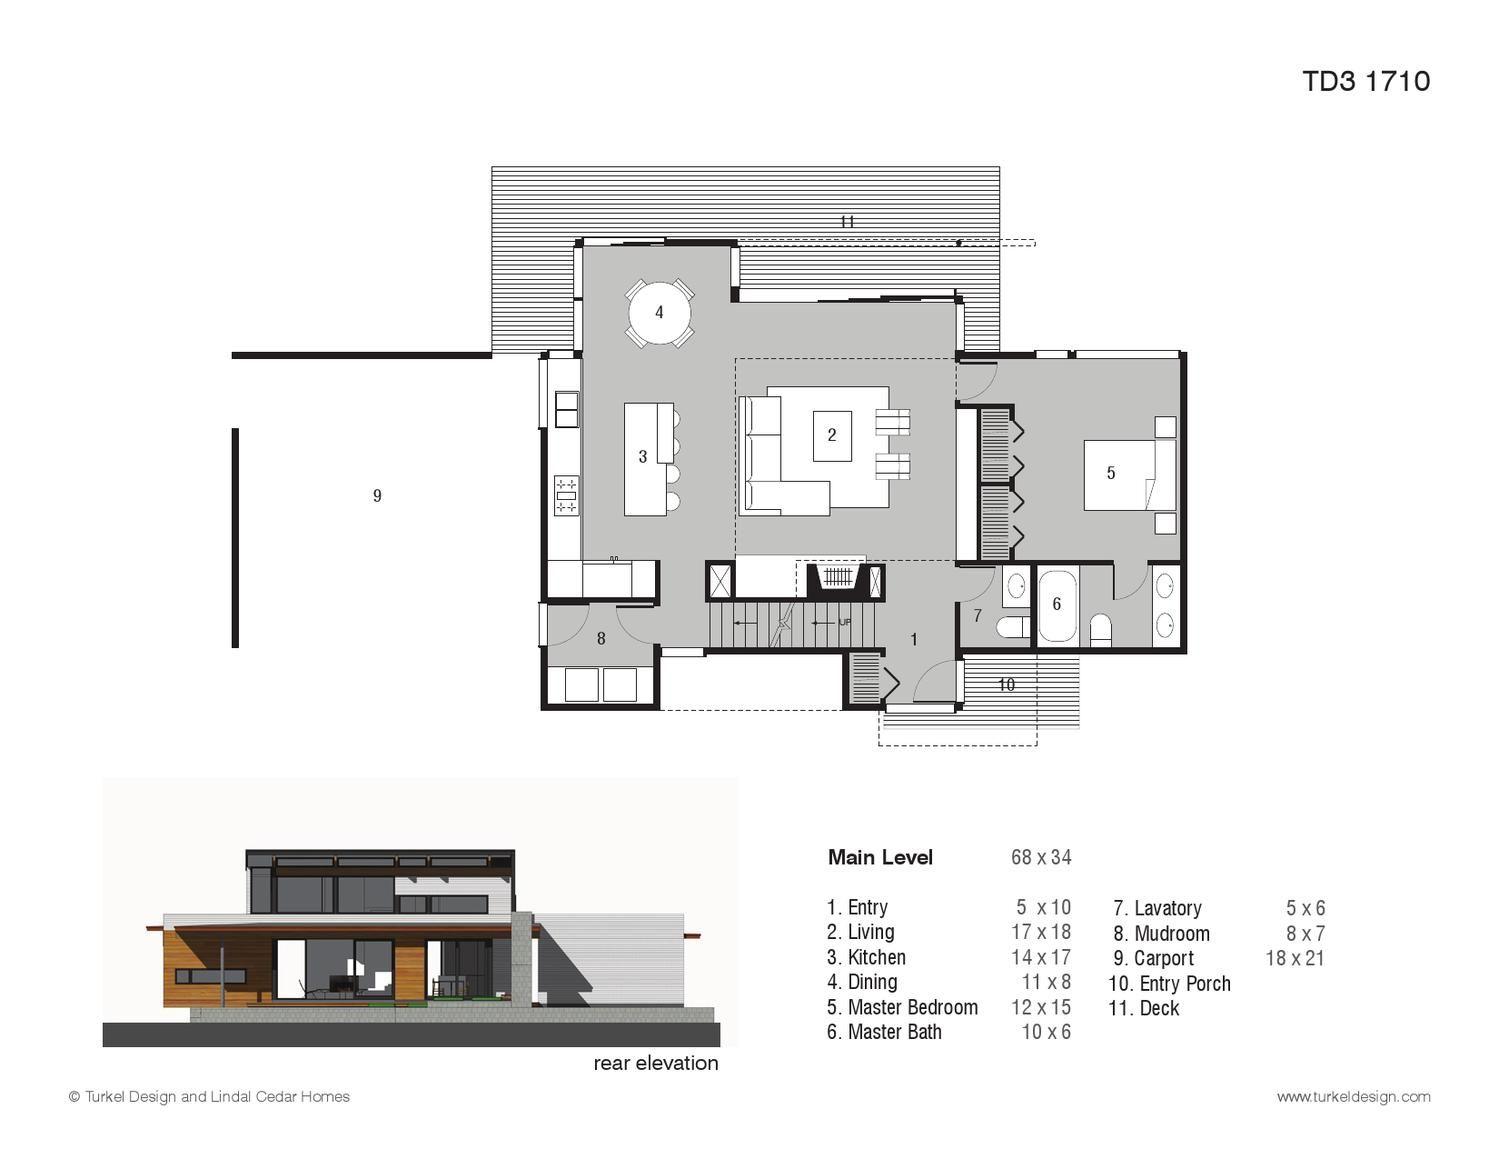 Turkel design plan library house for Lindal cedar home plans